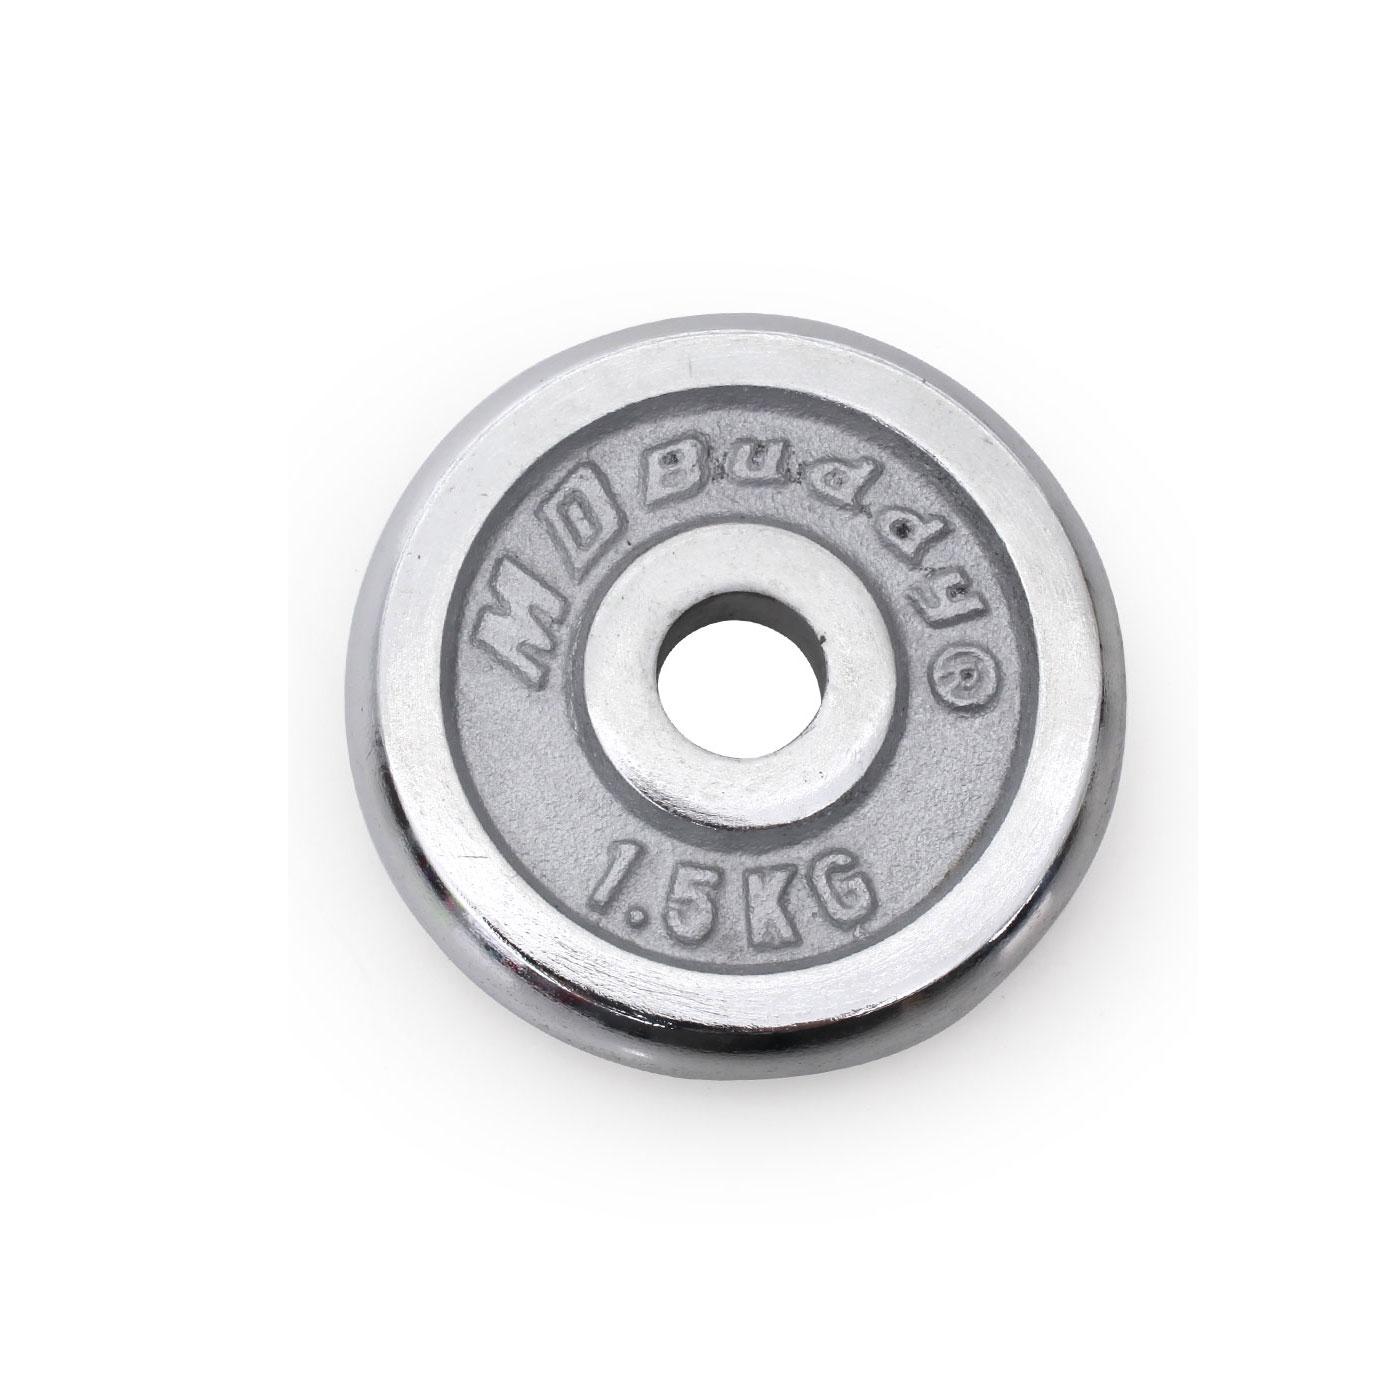 MDBuddy (1.5KG)電鍍槓片(單片) 6021801 - 銀